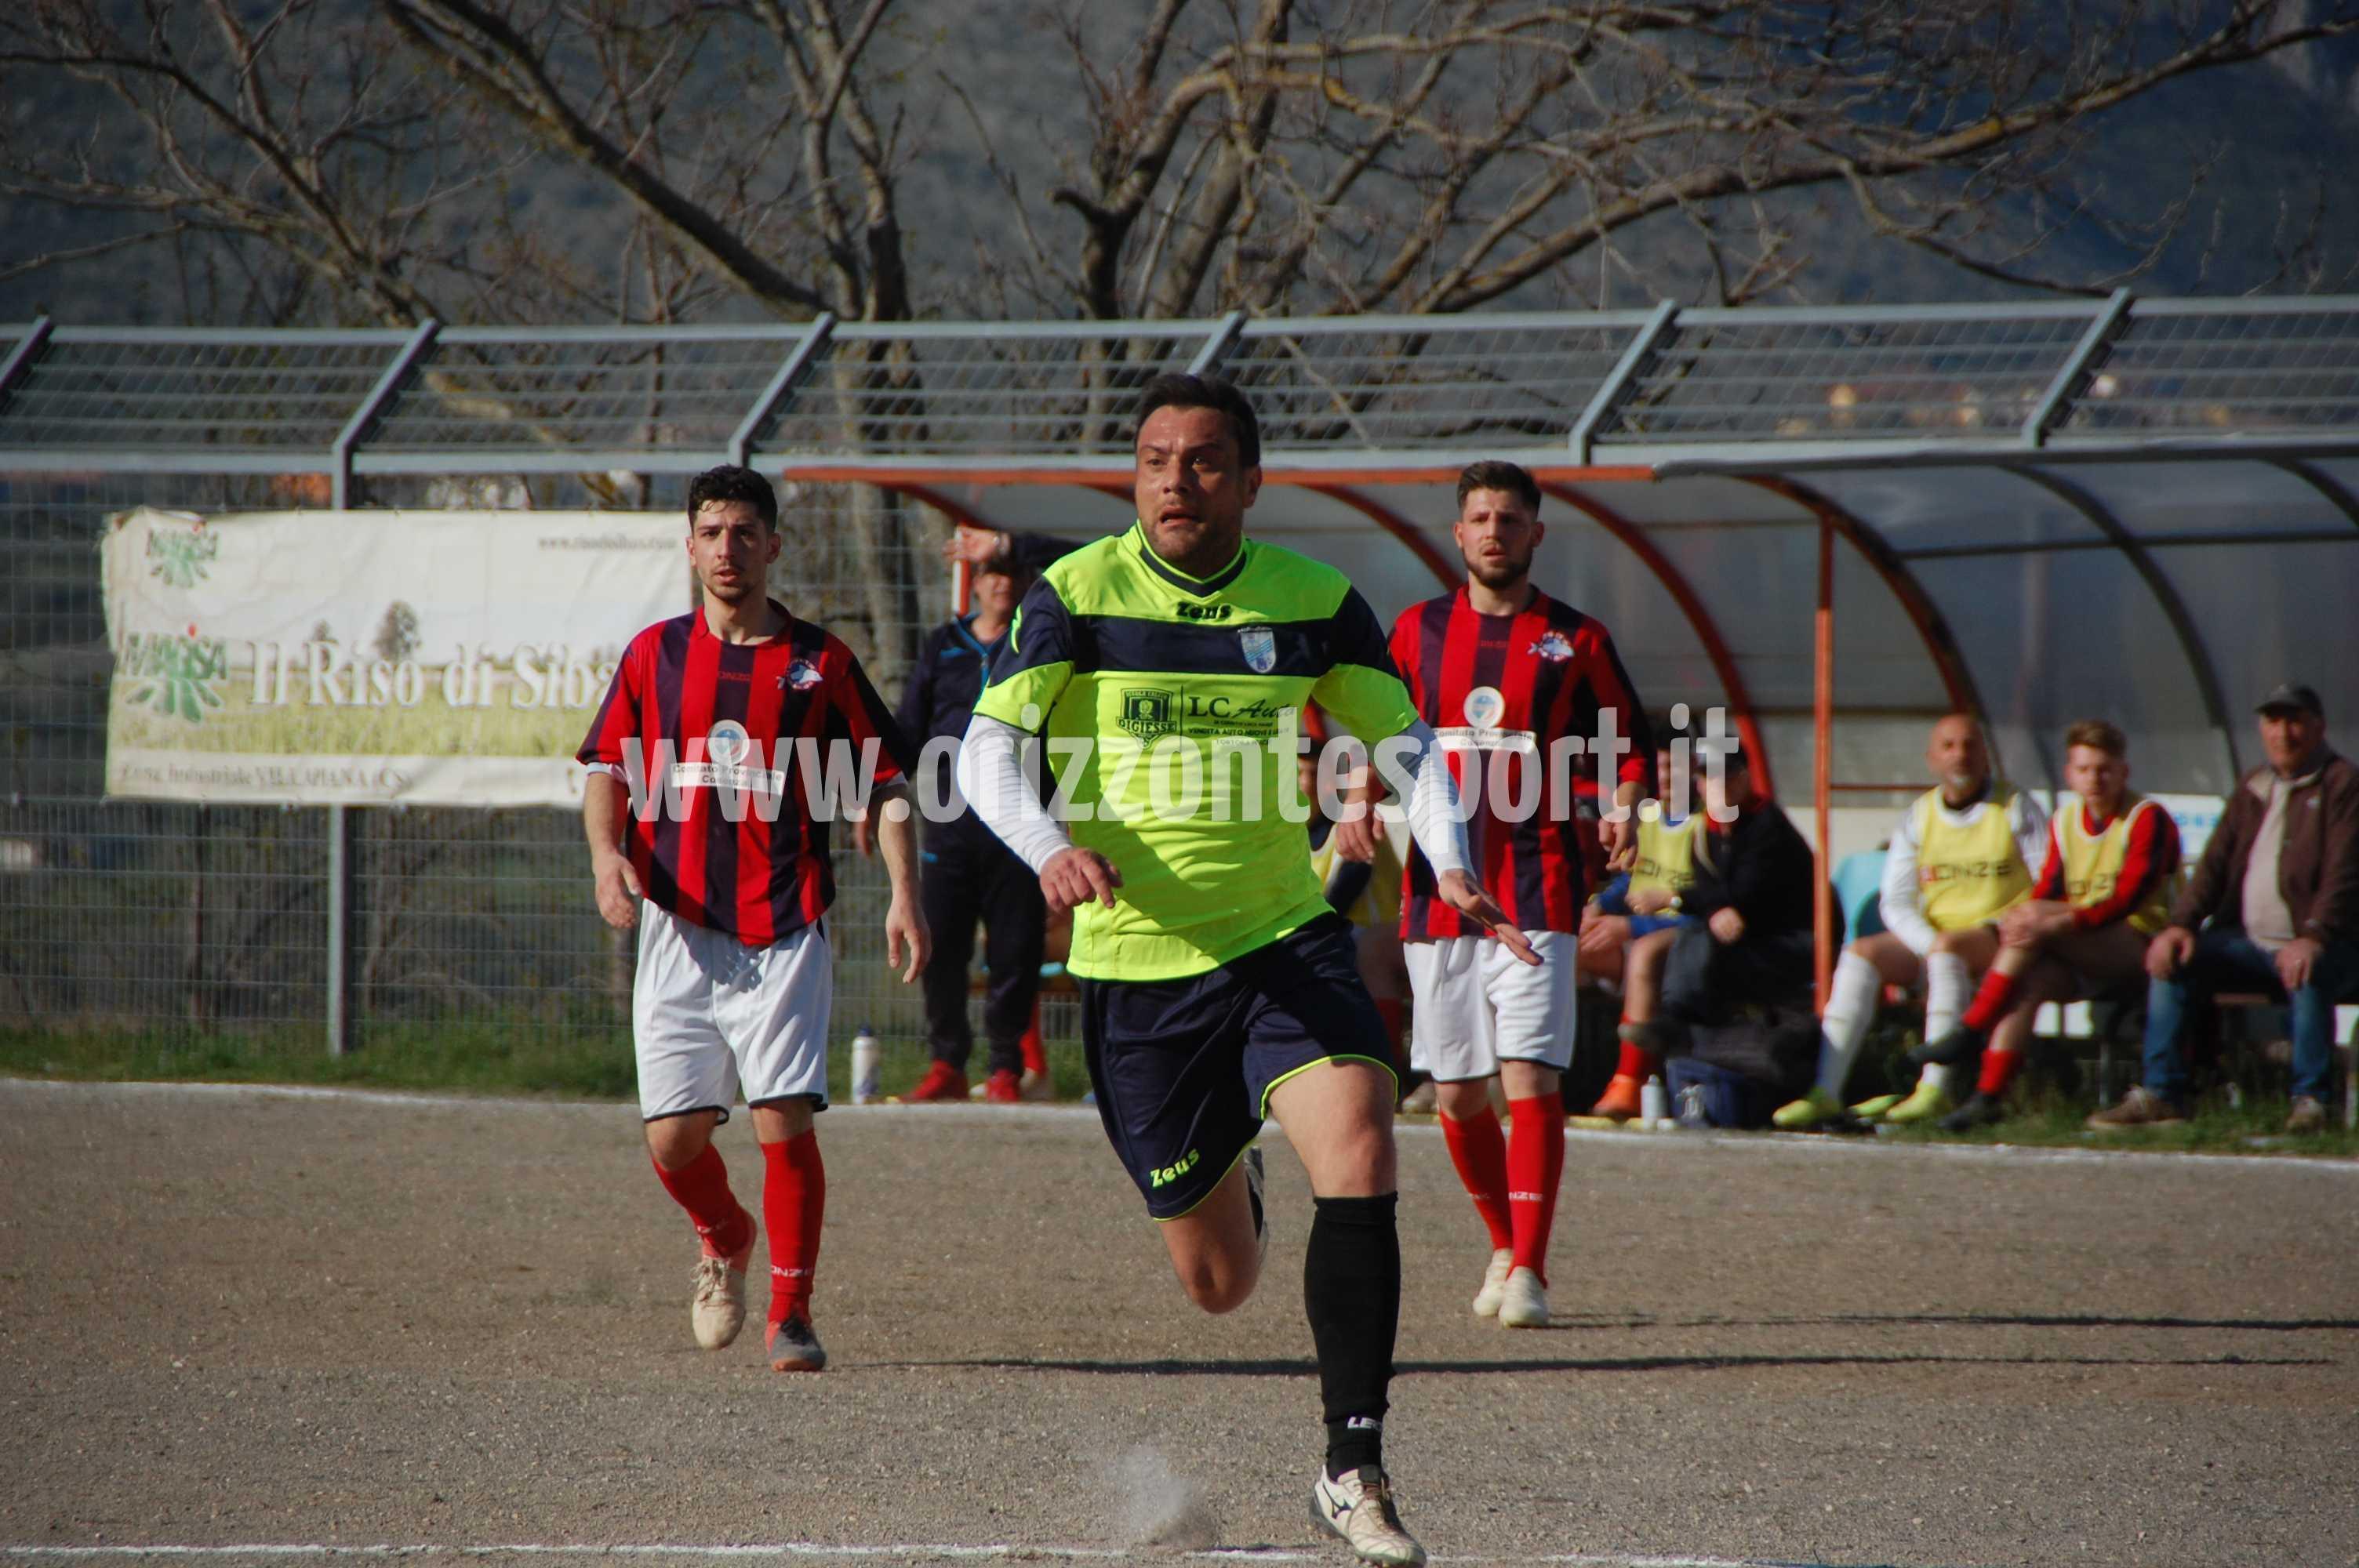 gnettimorano_praiatortora (59)